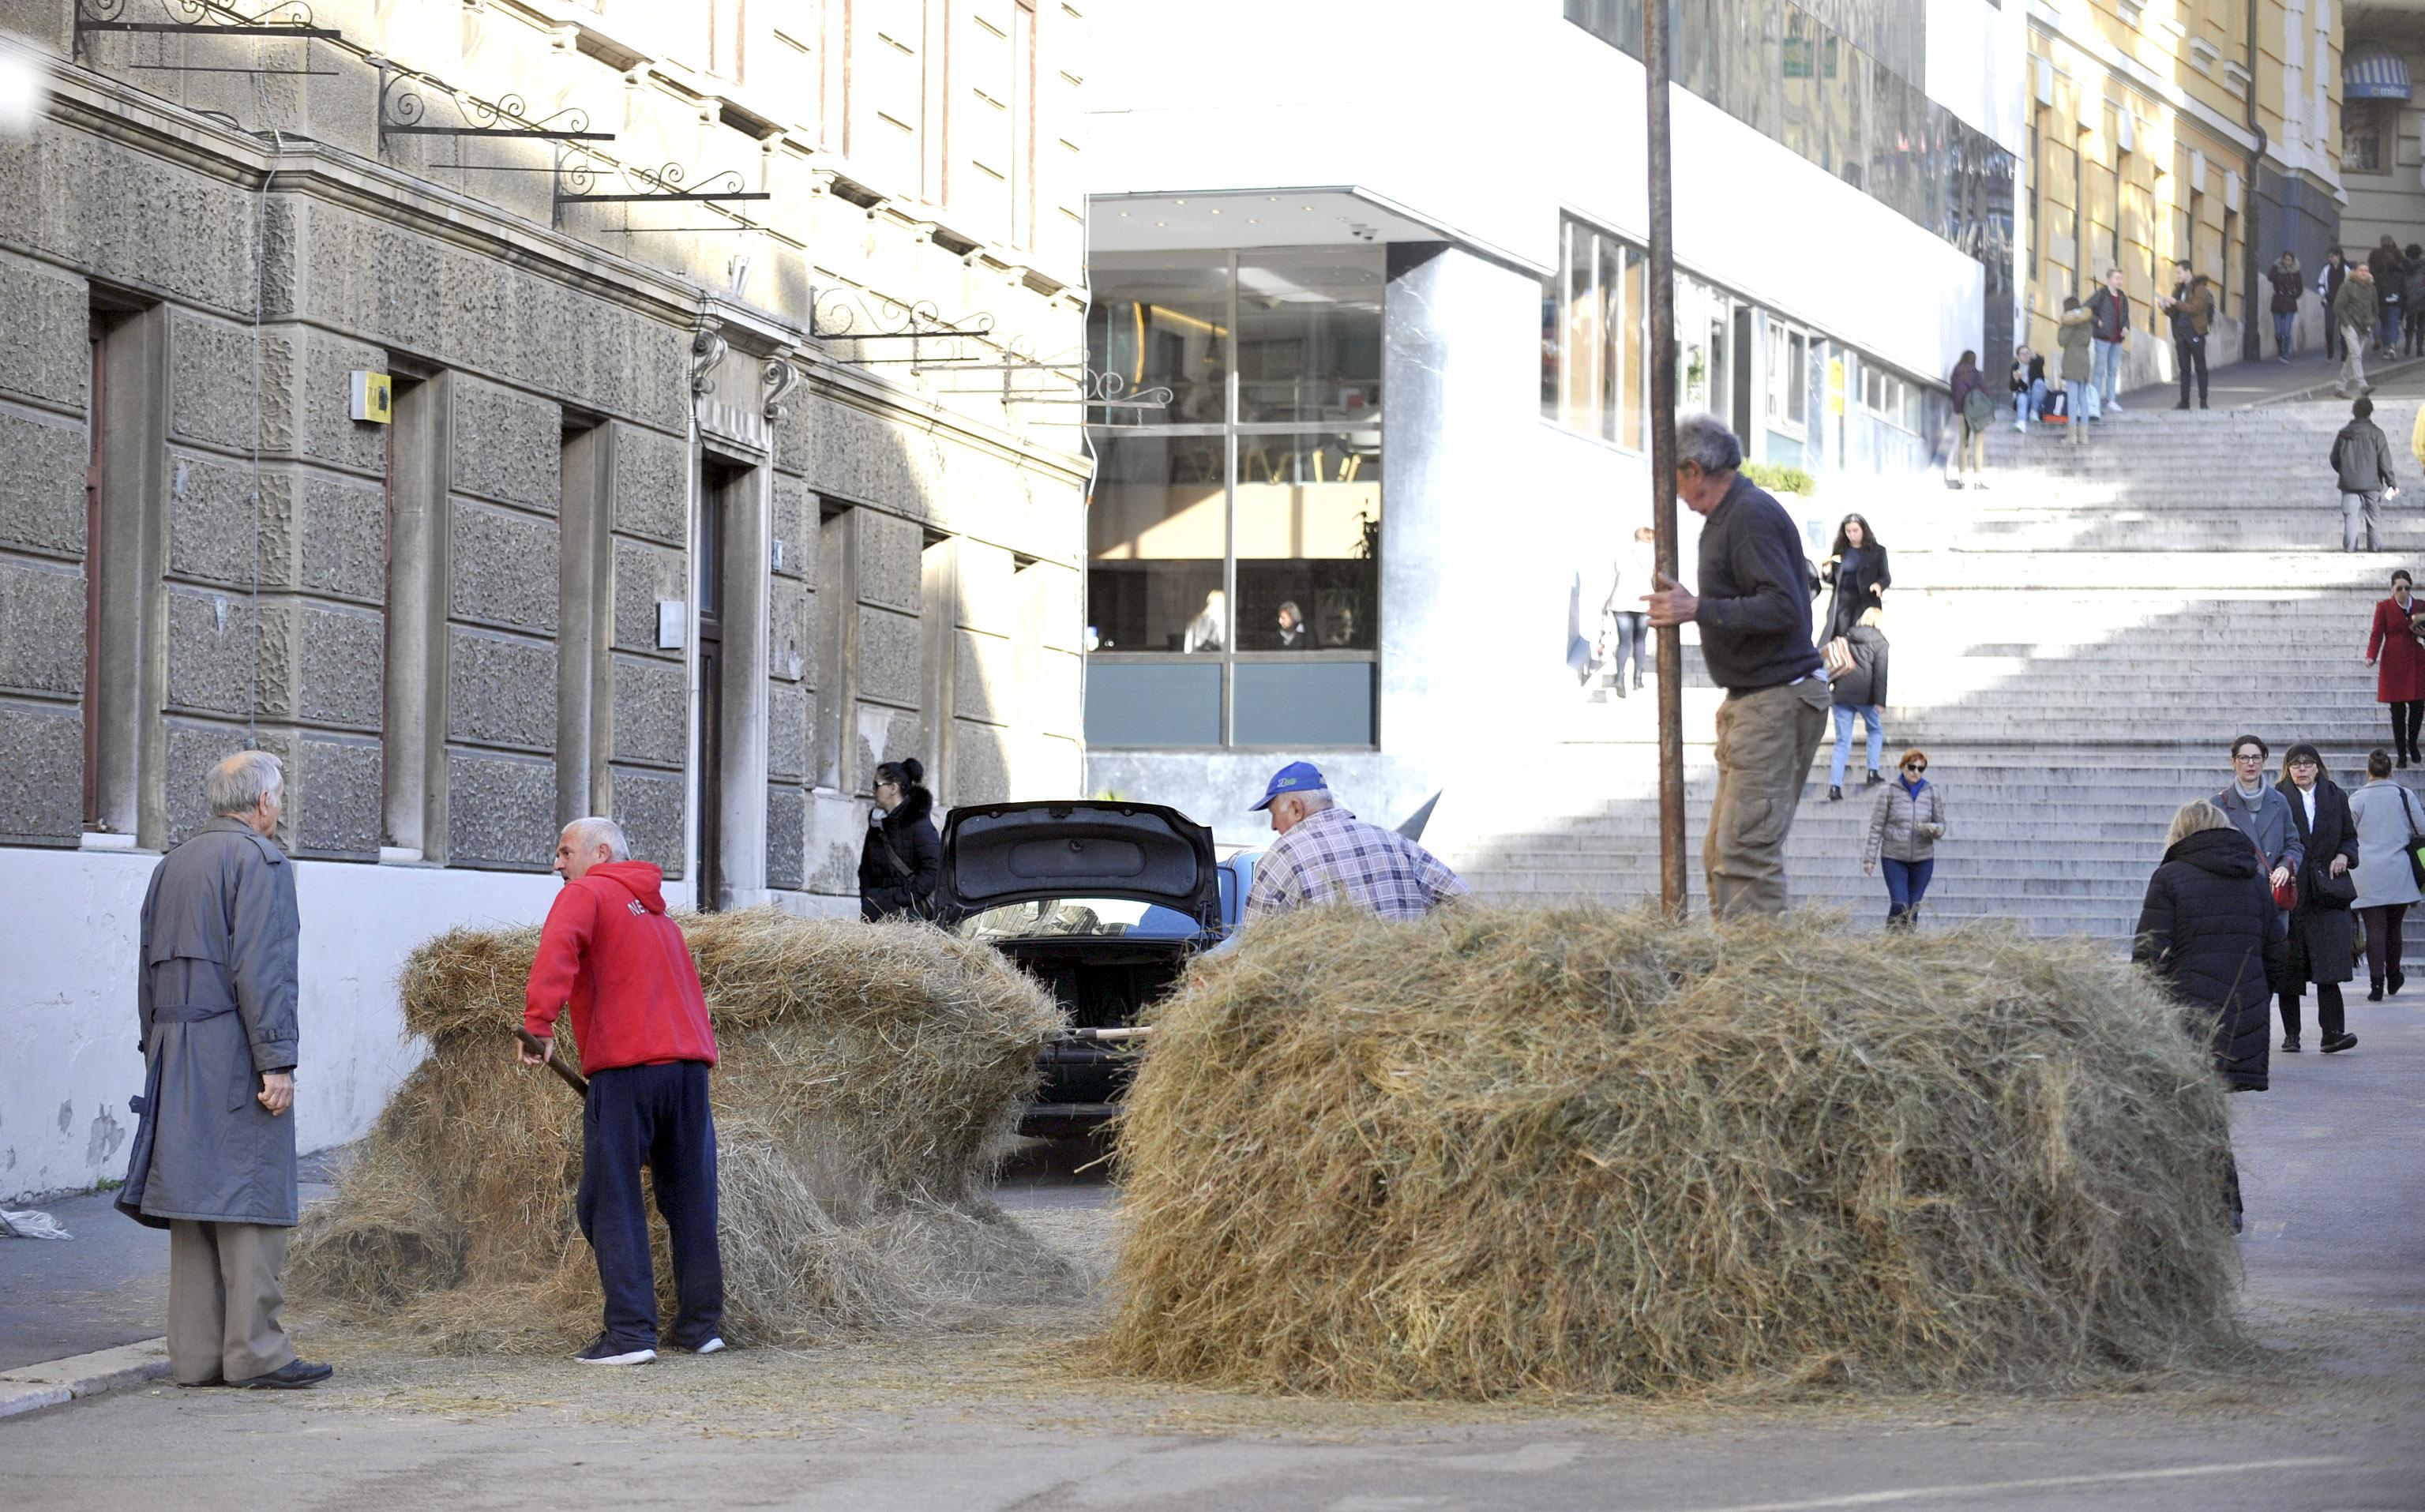 Ponovno postavljanje Stoga sijena na Trgu 128. brigade / Snimio Vedran KARUZA